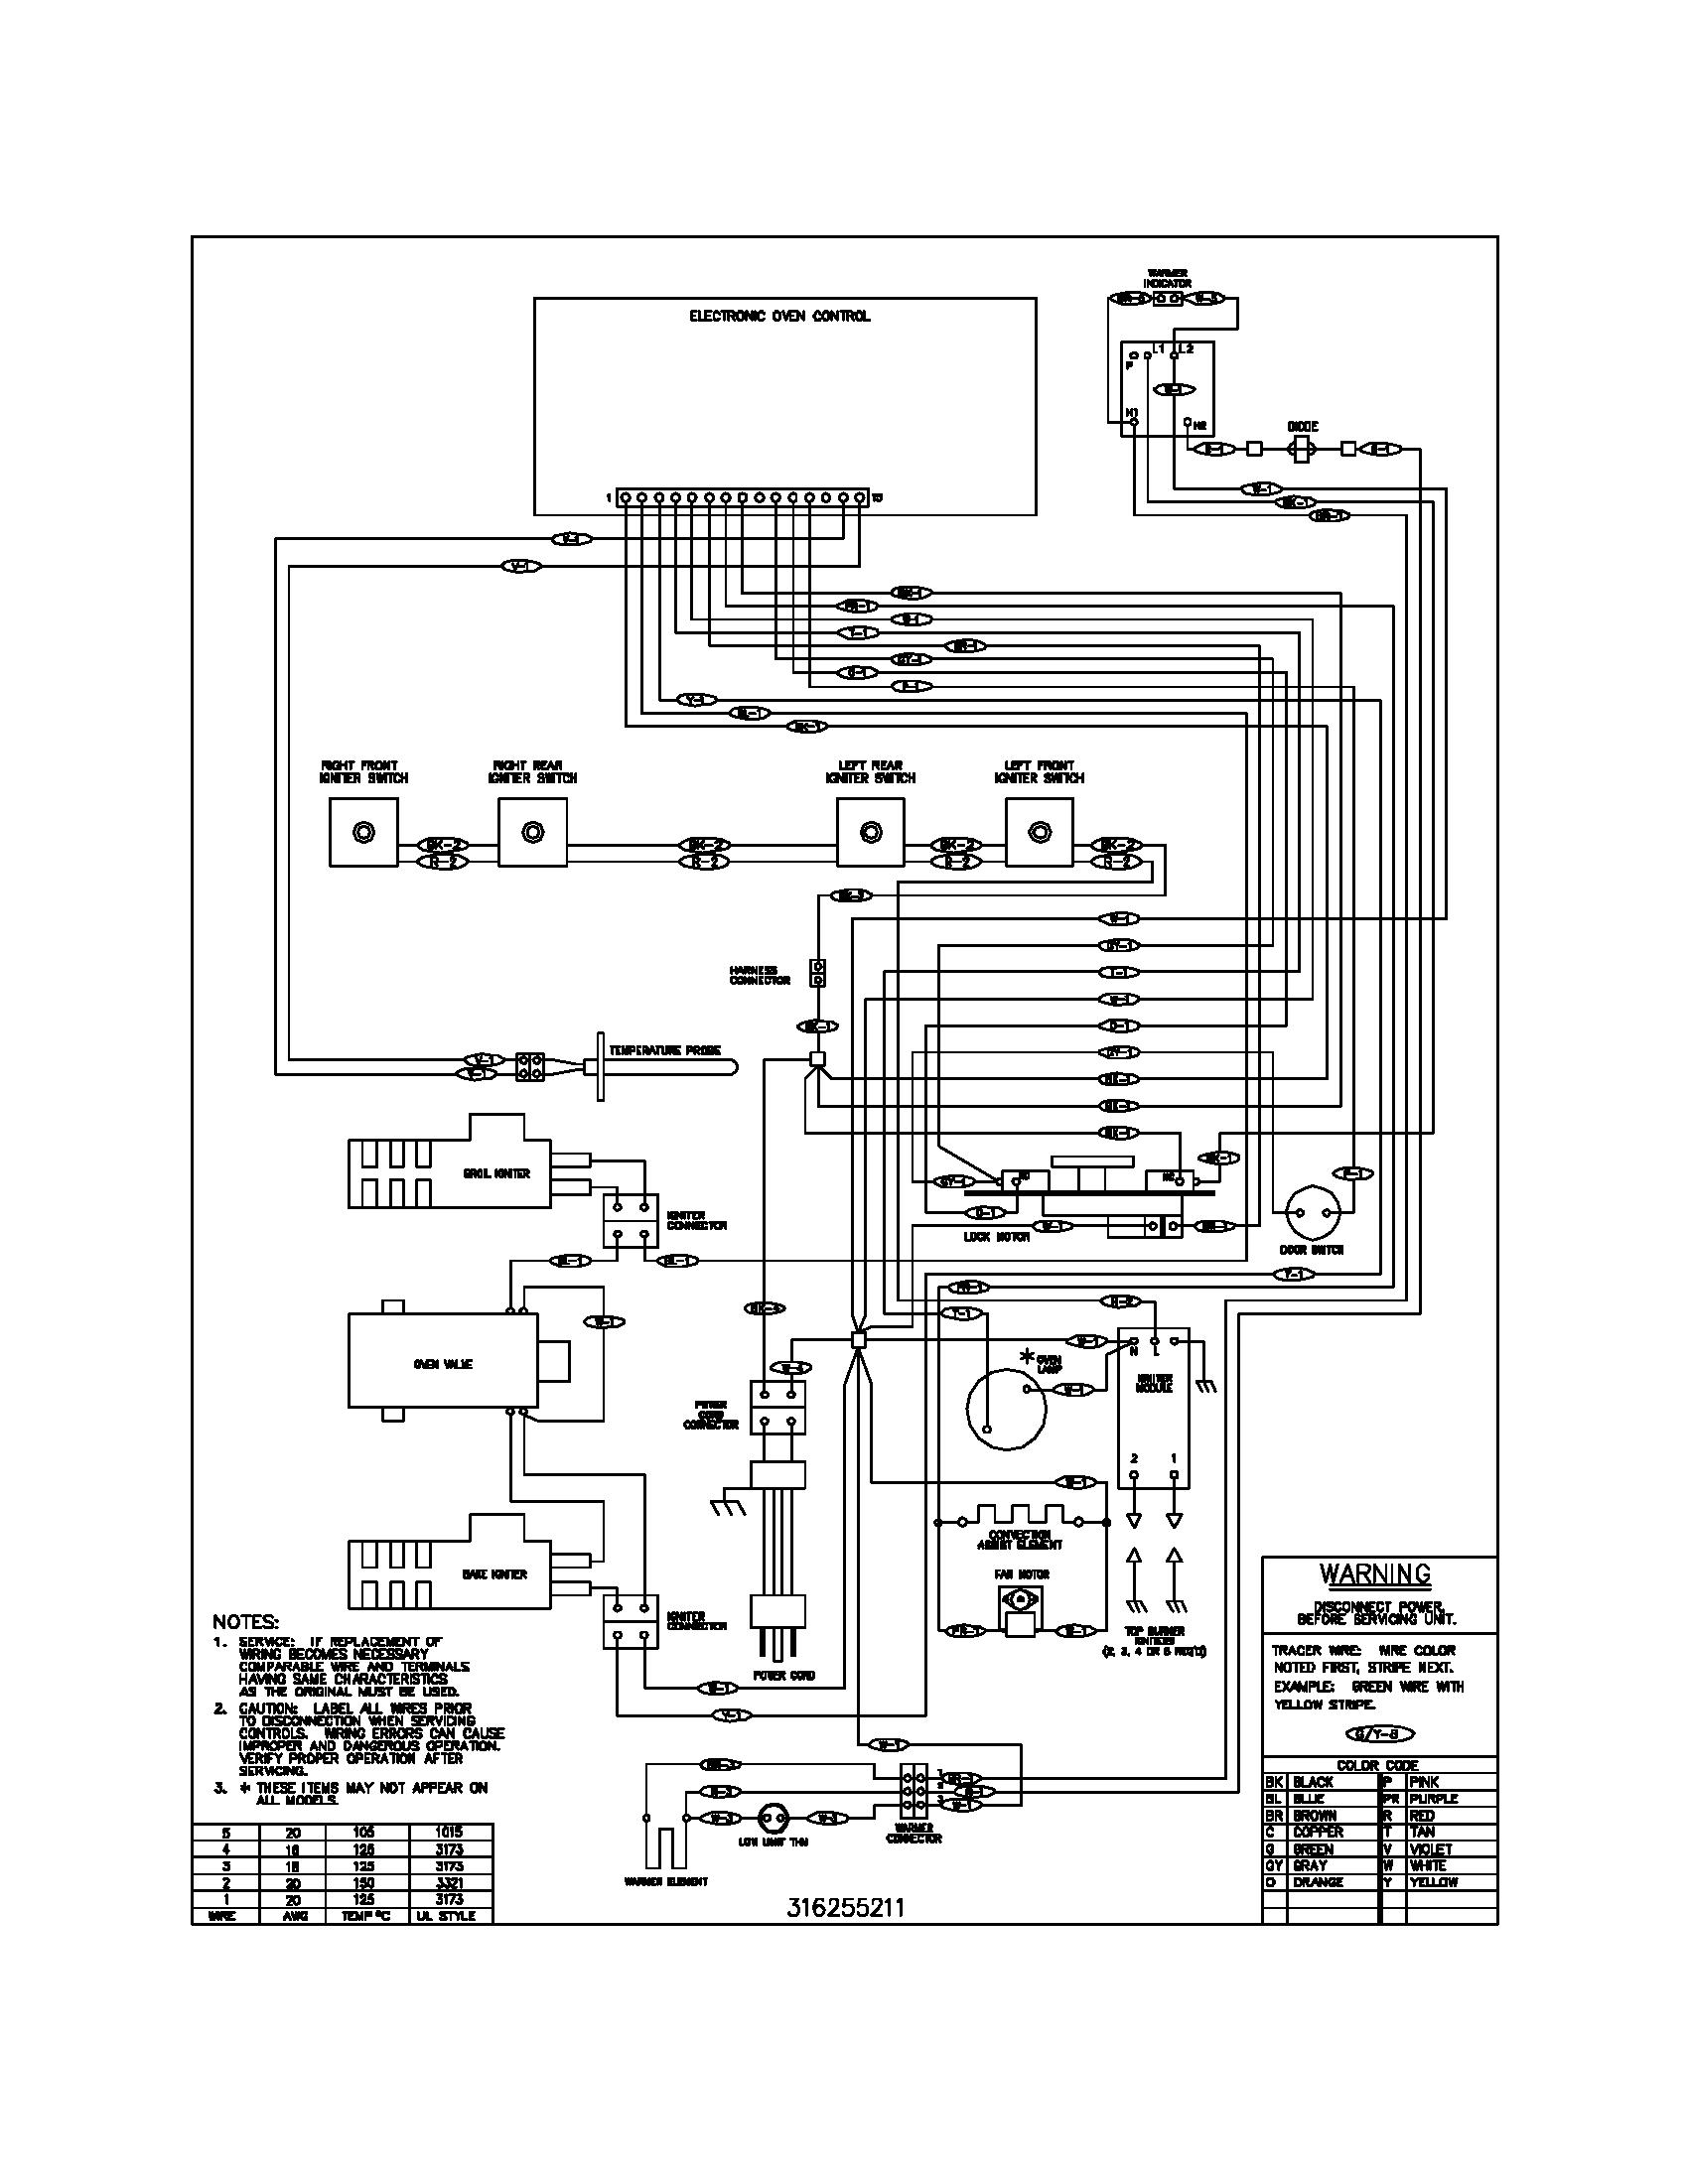 telephone wiring diagram webtorme flowchart symbols defined true refrigeration wir… for true cooler compressor wiring diagram free download wiring wiring diagram parts for true cooler compressor